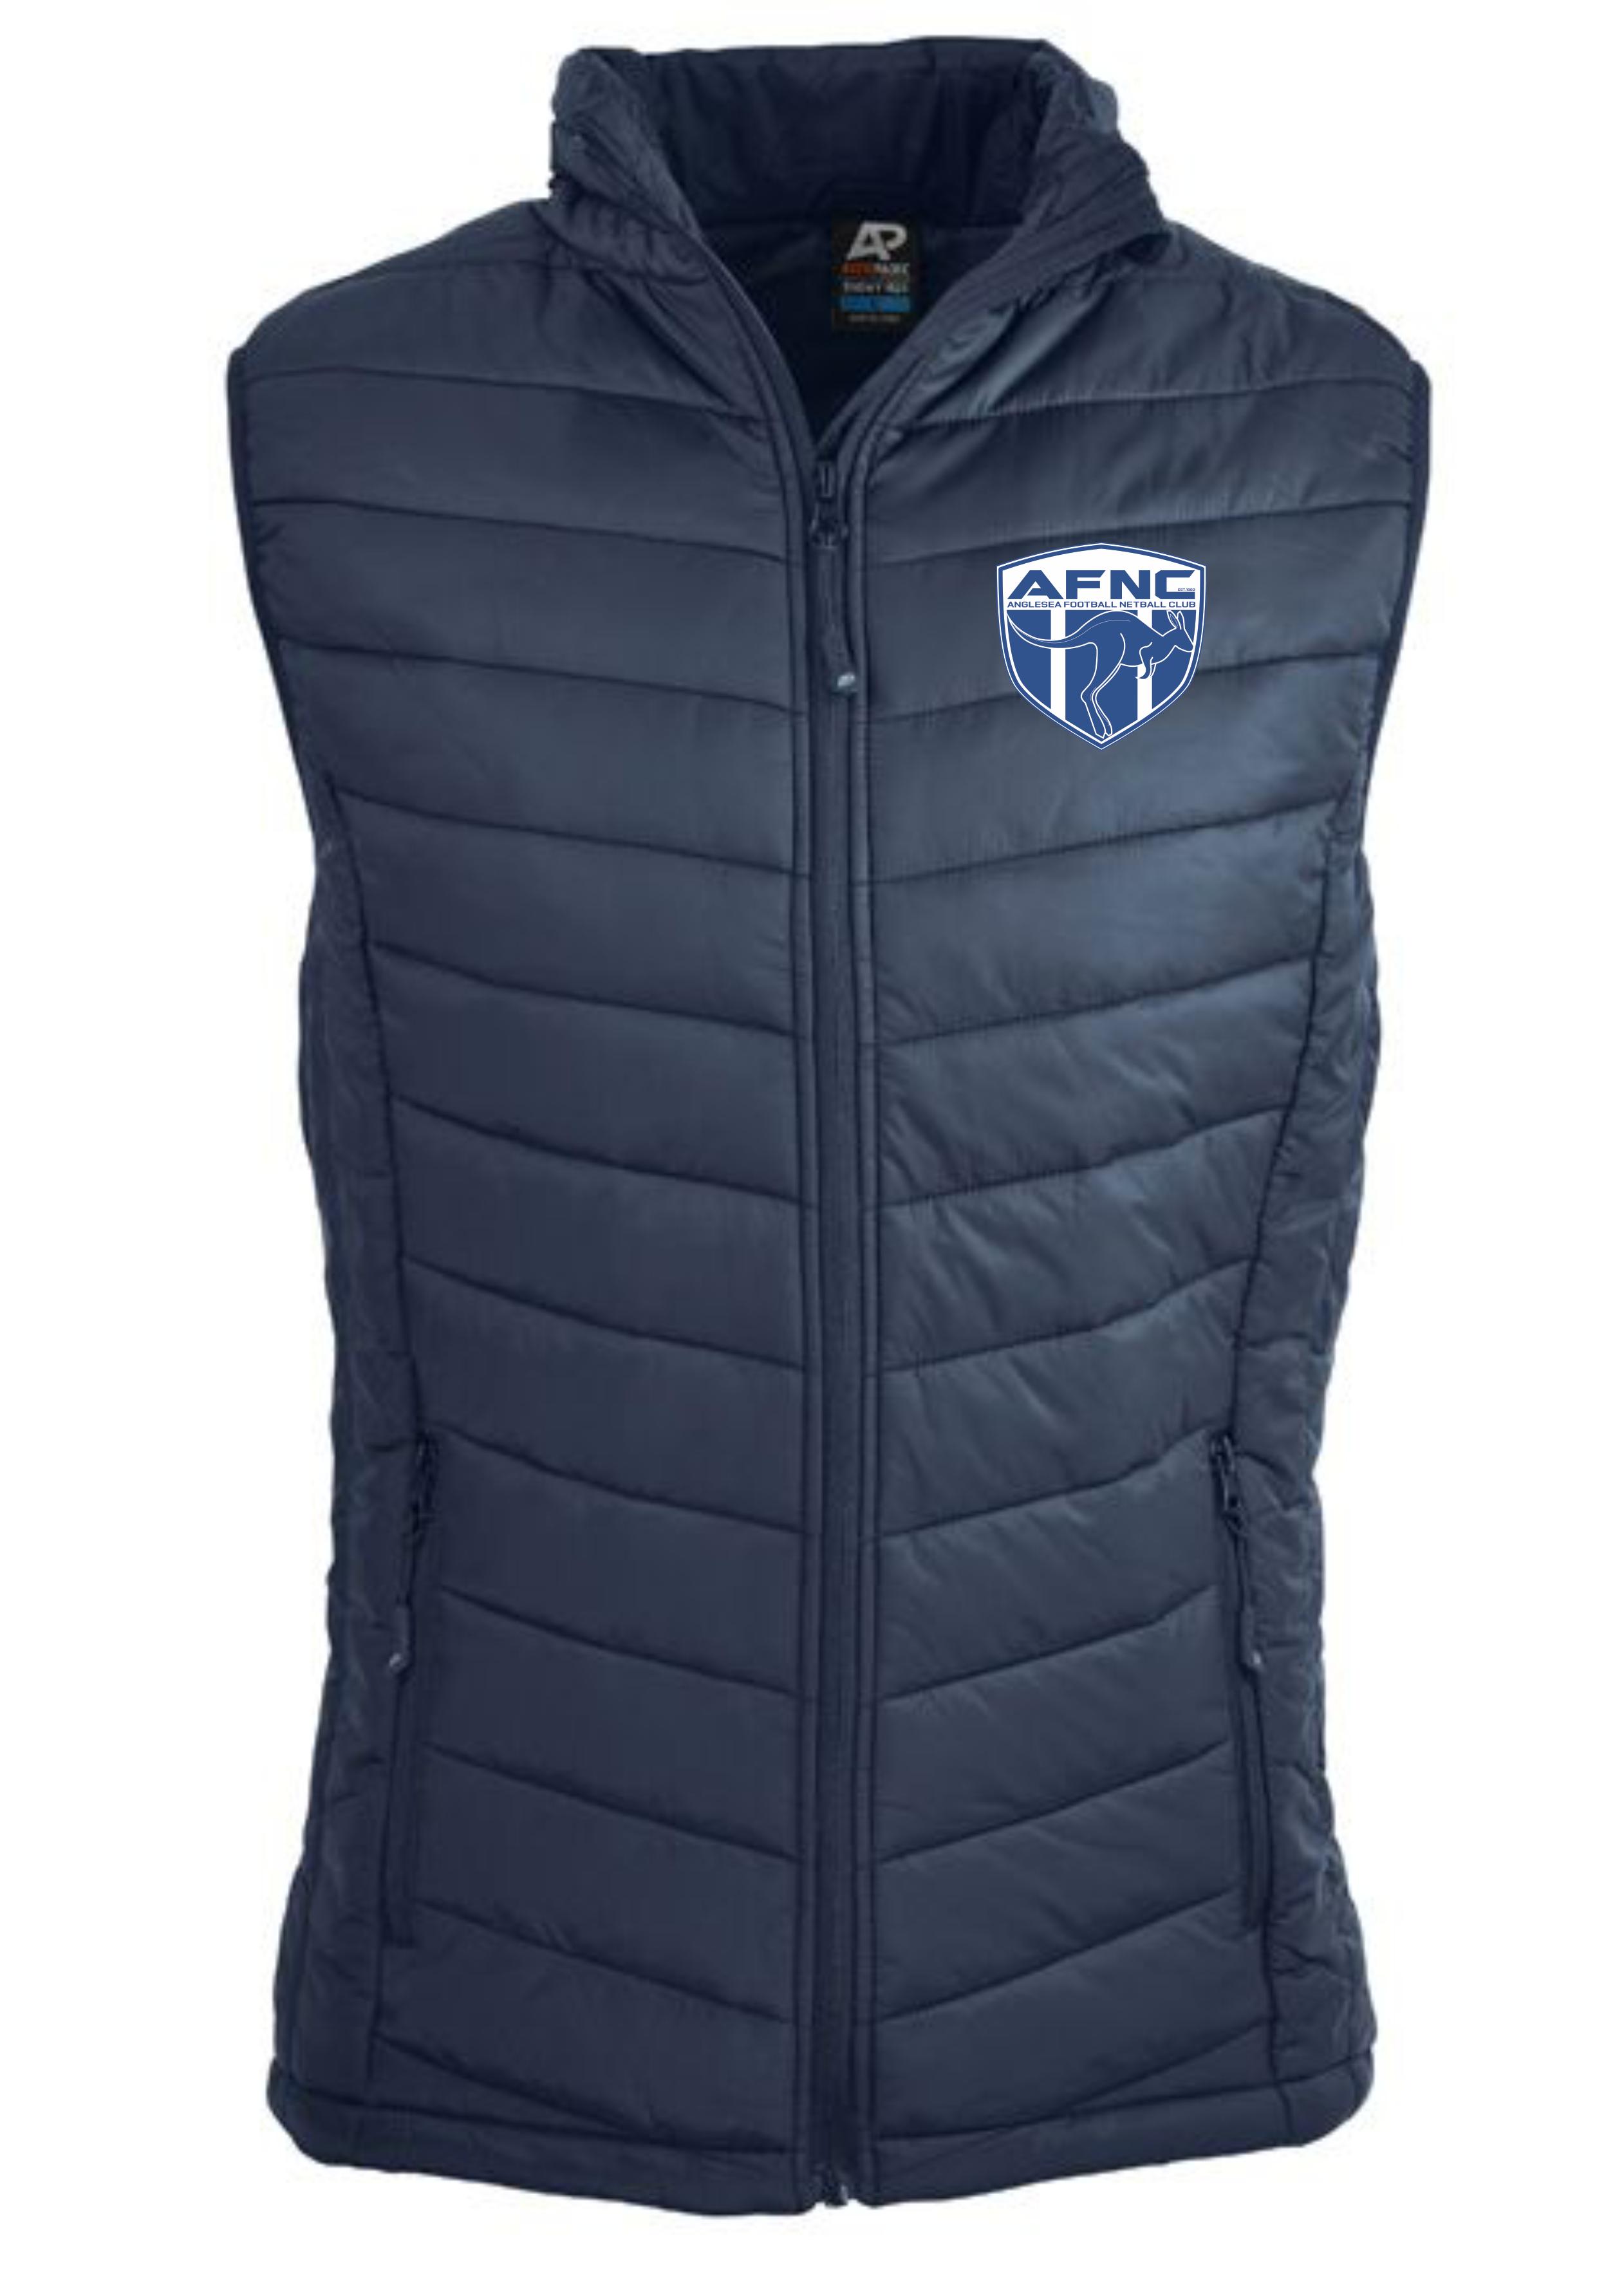 Men's Navy Snowy Puffer Vest